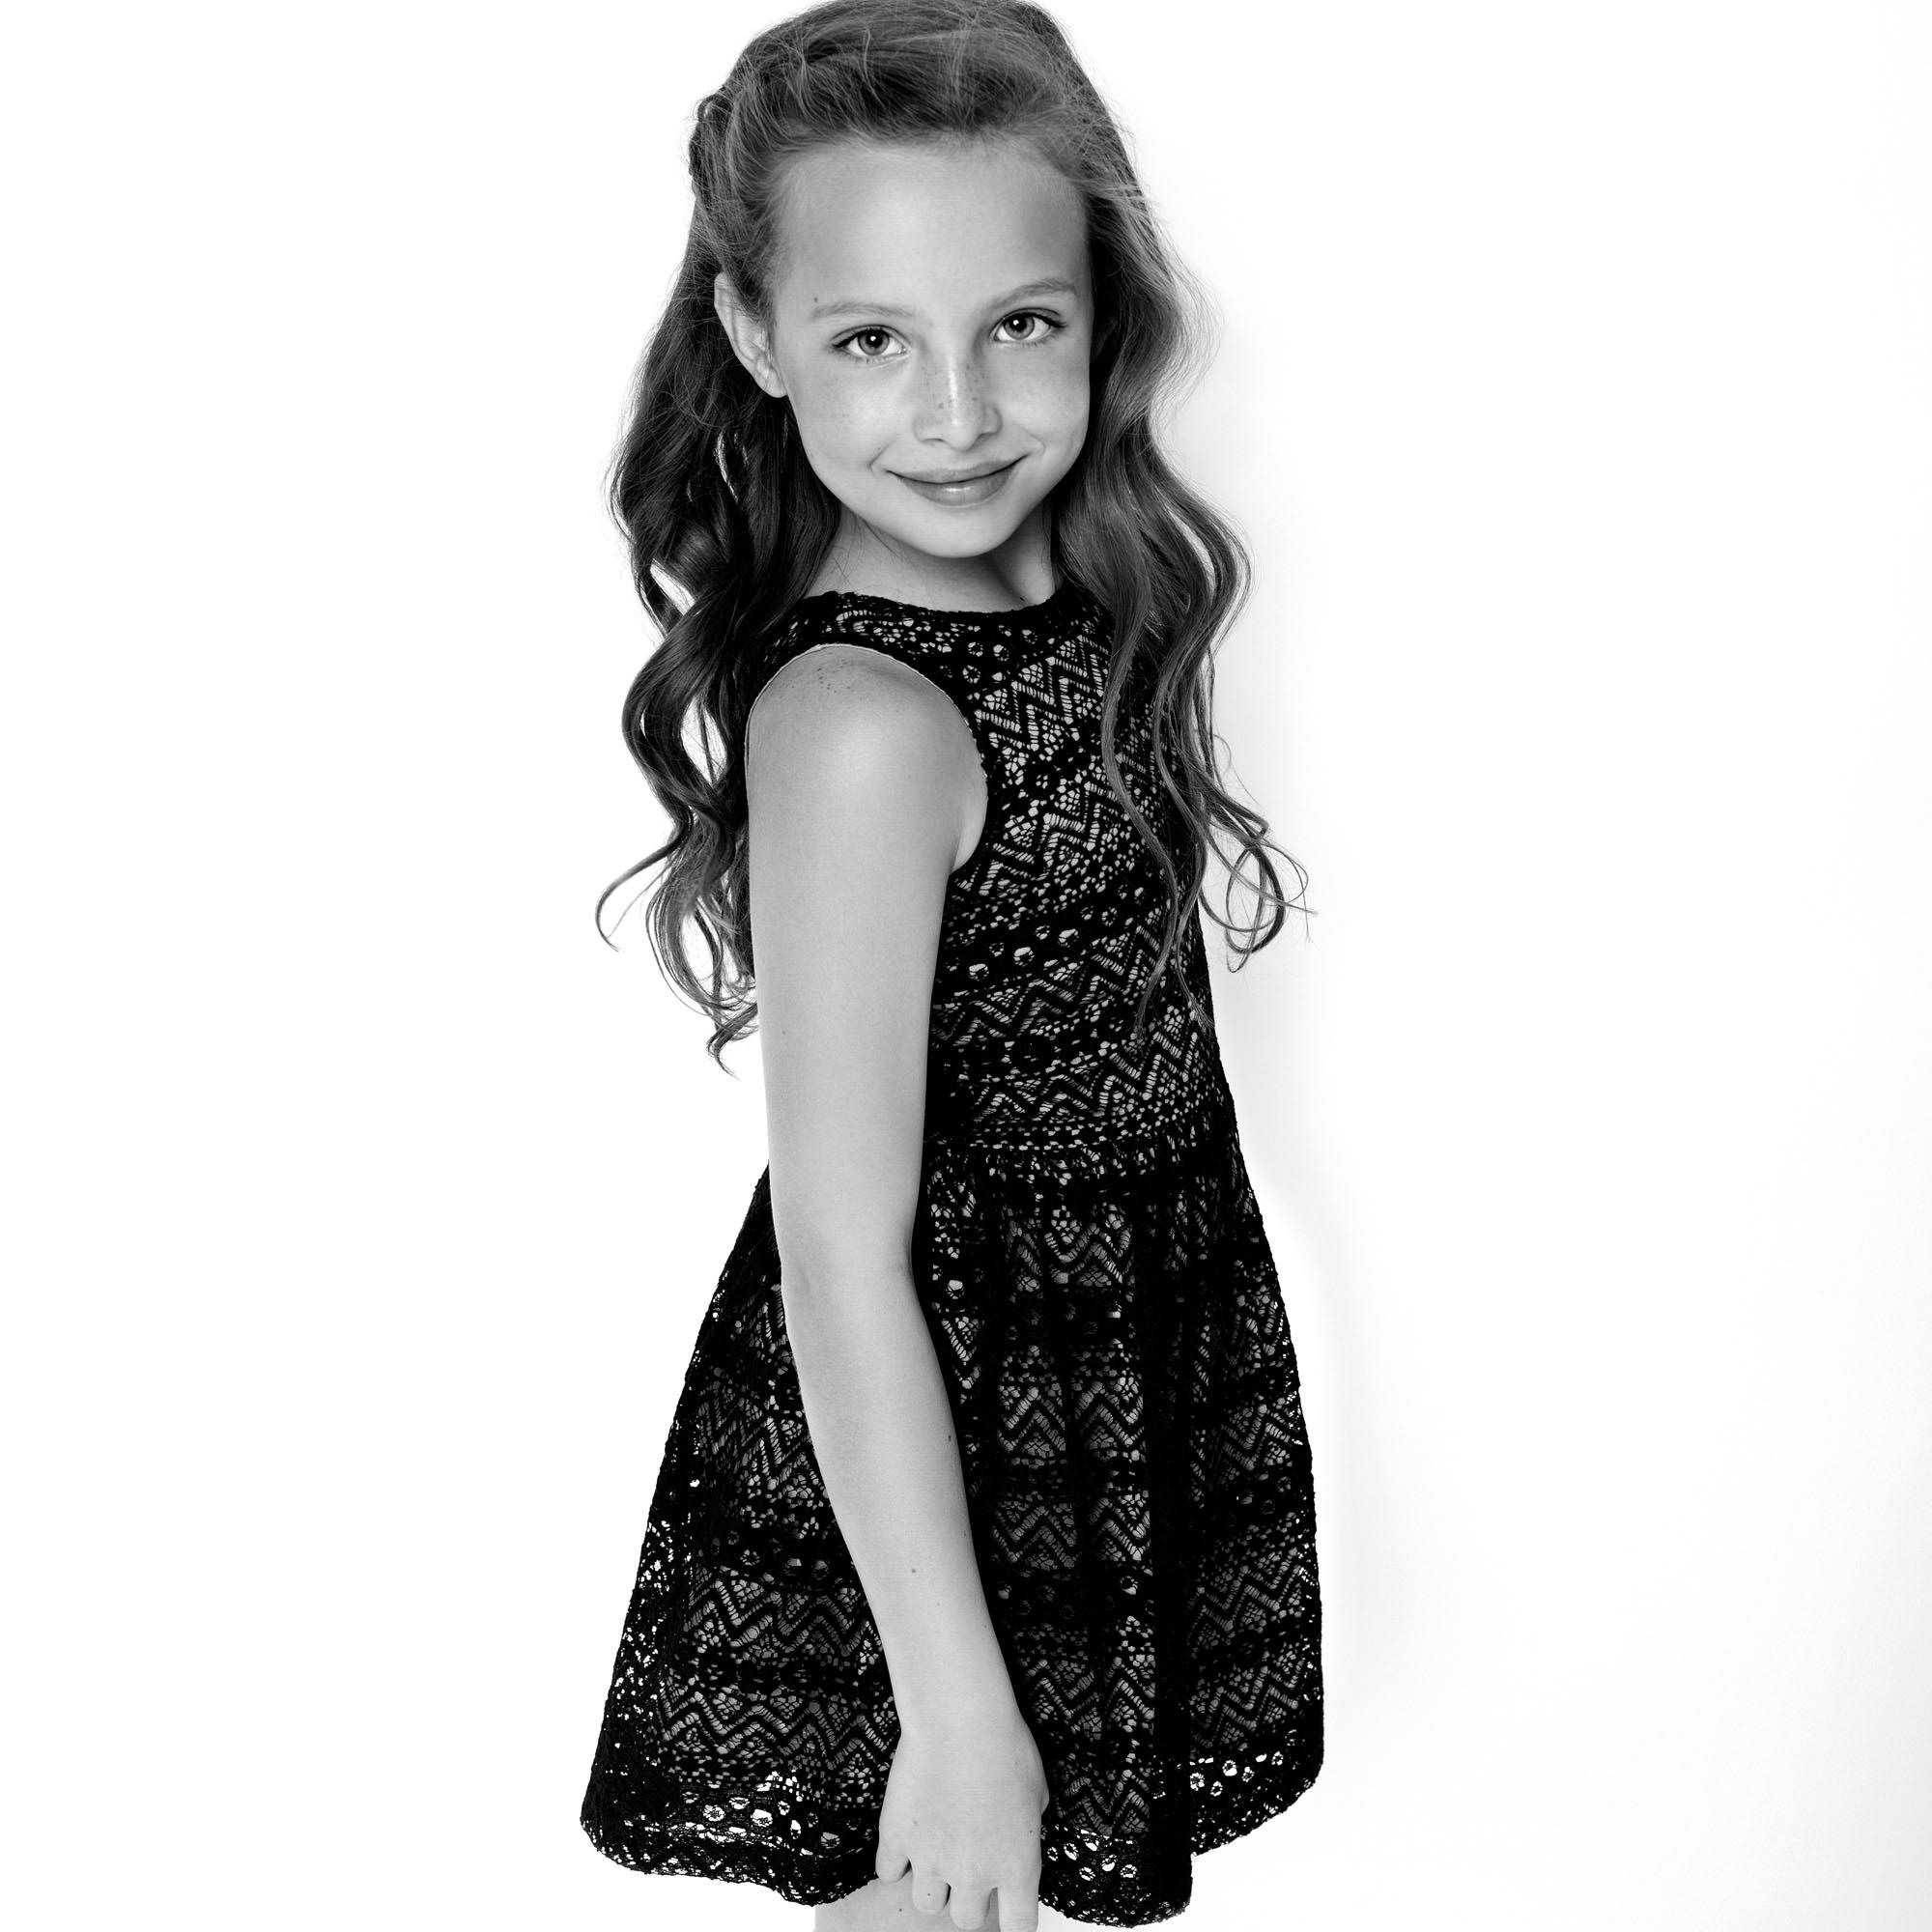 nyc-photographers-kids-modeling-10001.jpg